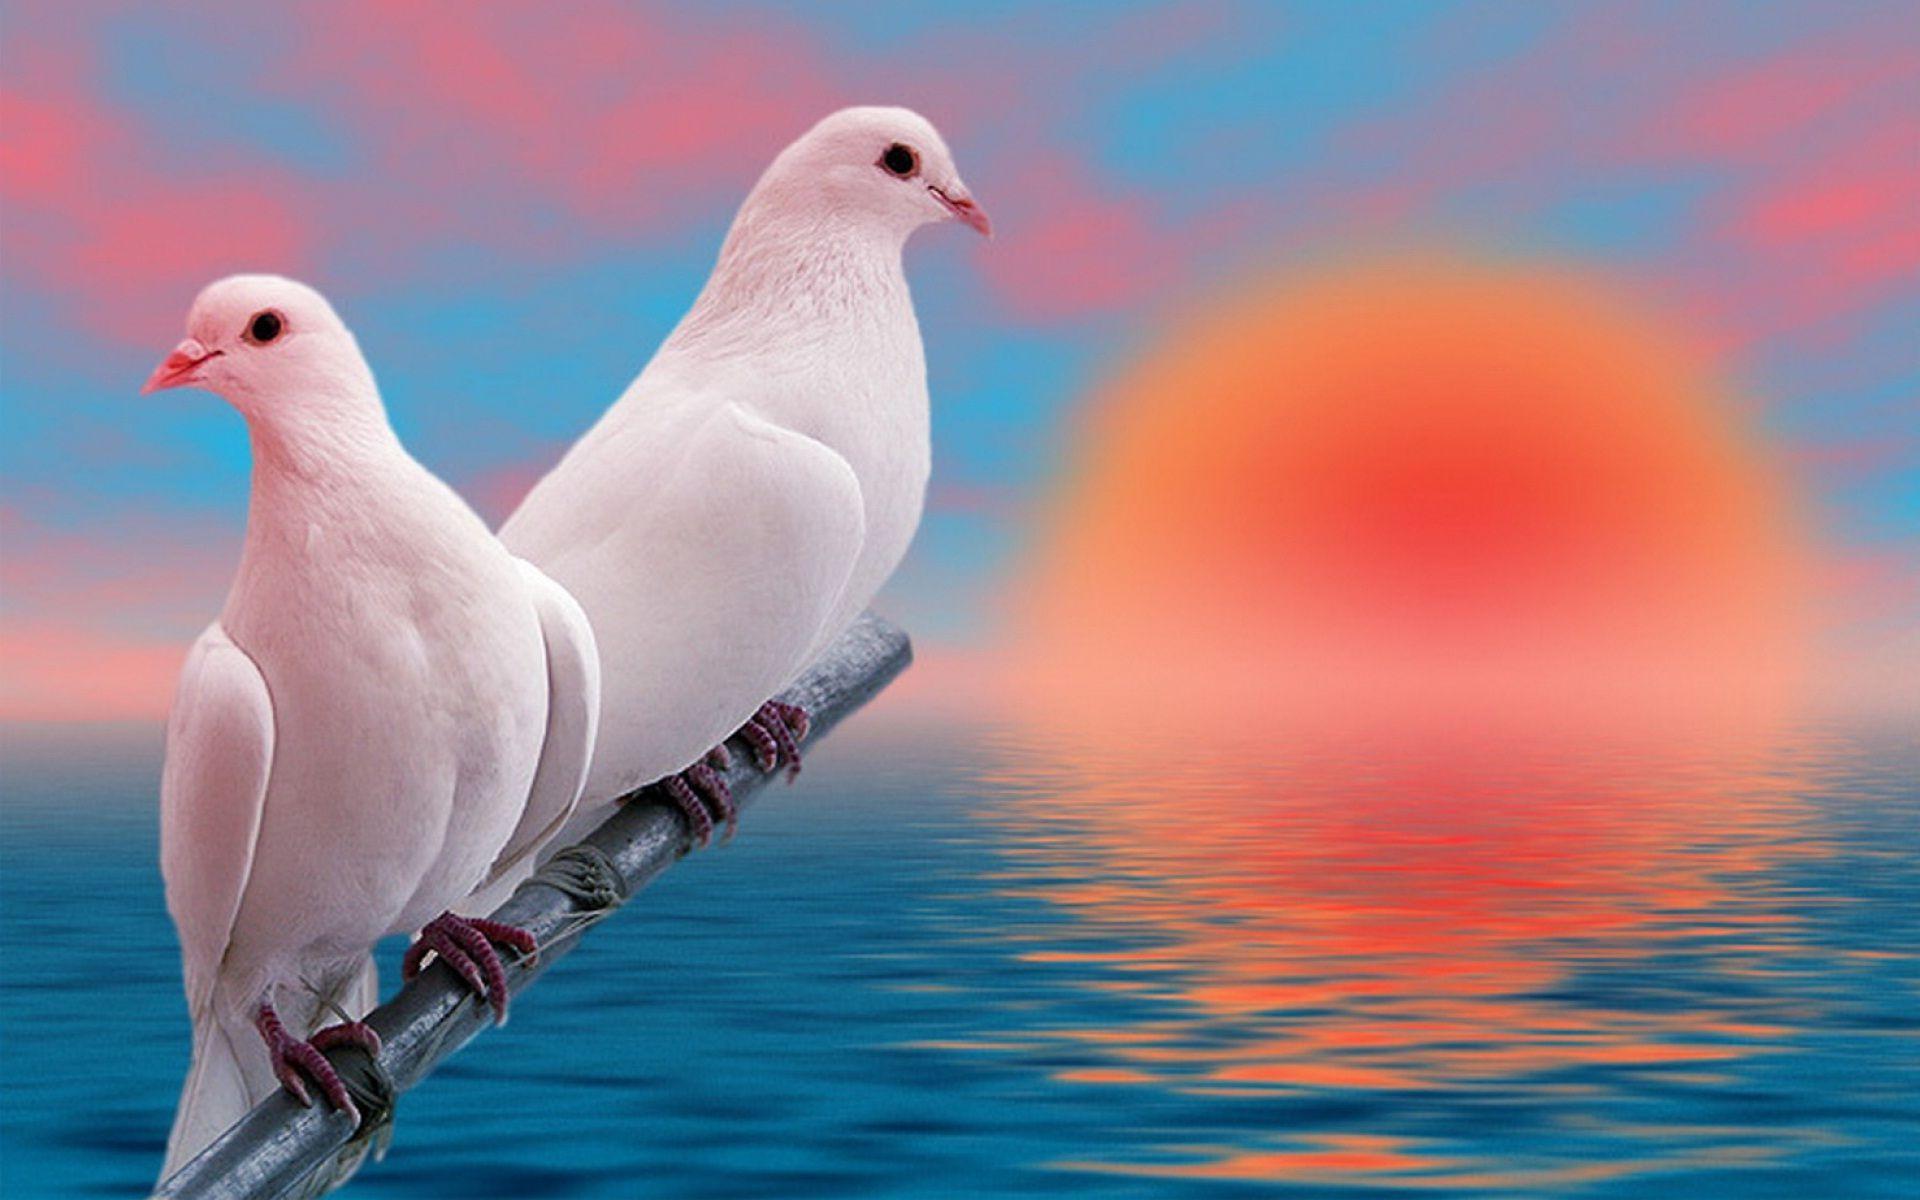 Mobile Phone Wallpapers Love Birds Wallpaper Cave